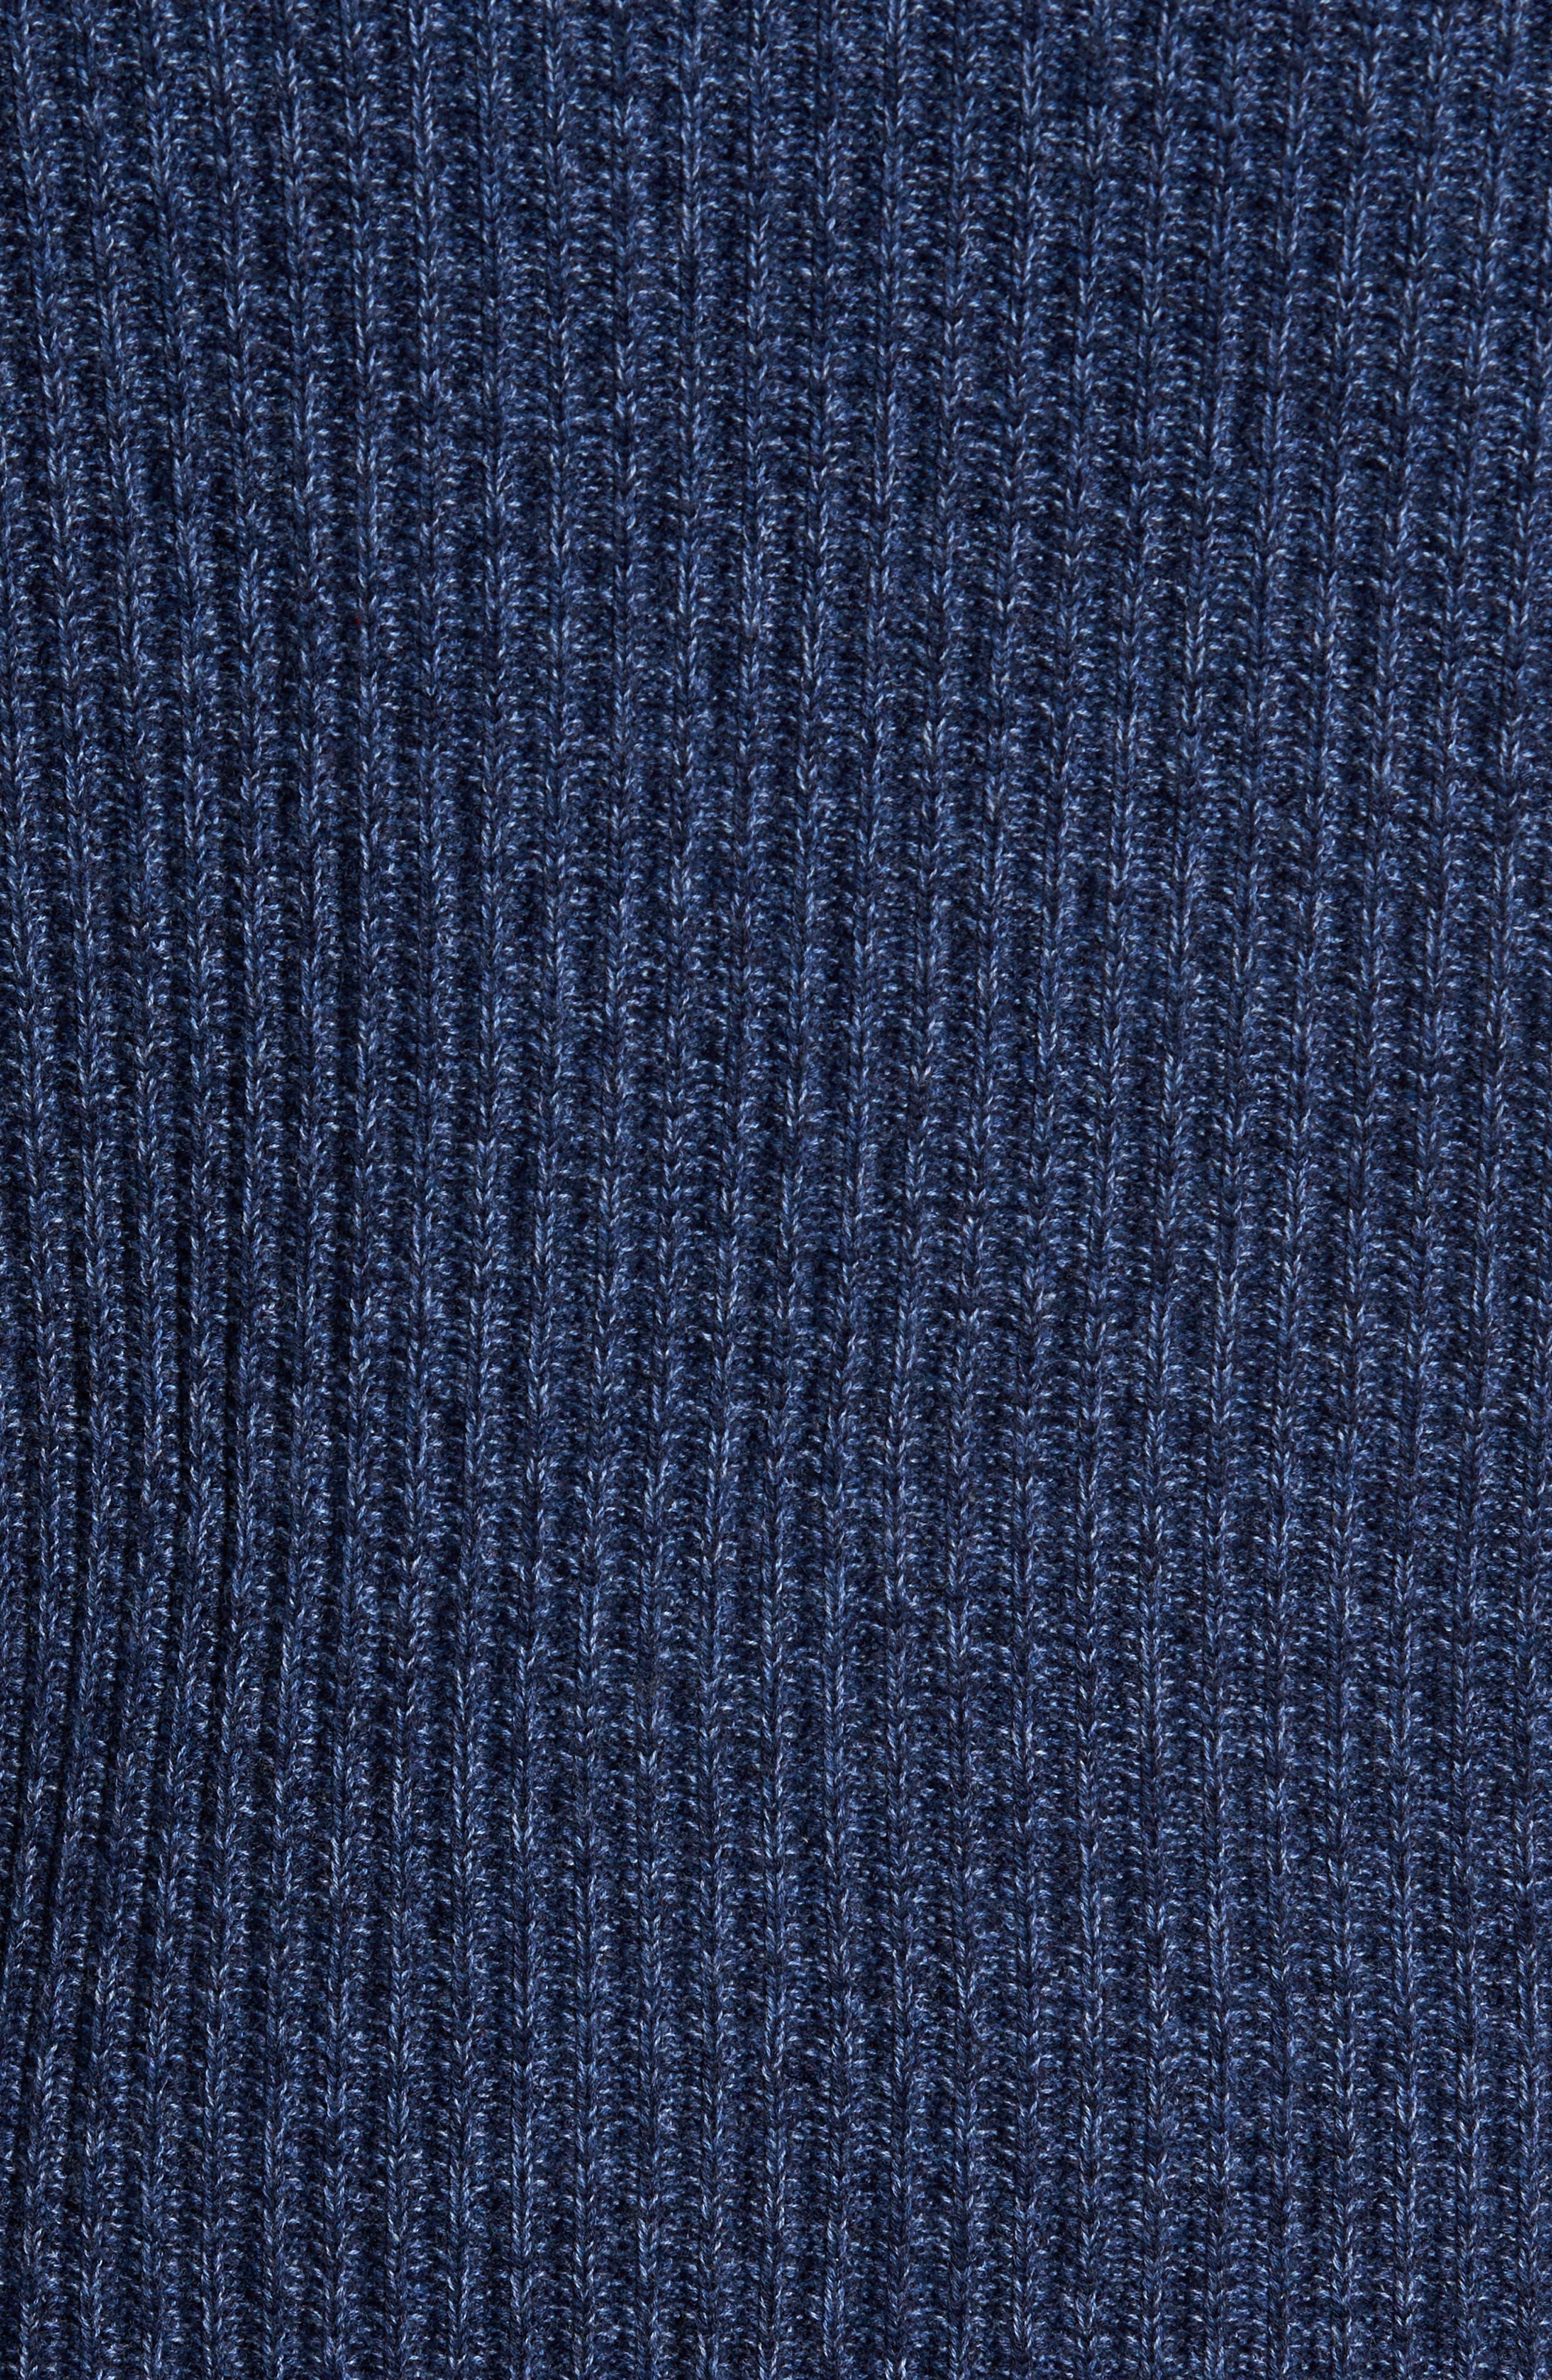 Medina Marl Cotton Sweater,                             Alternate thumbnail 5, color,                             001